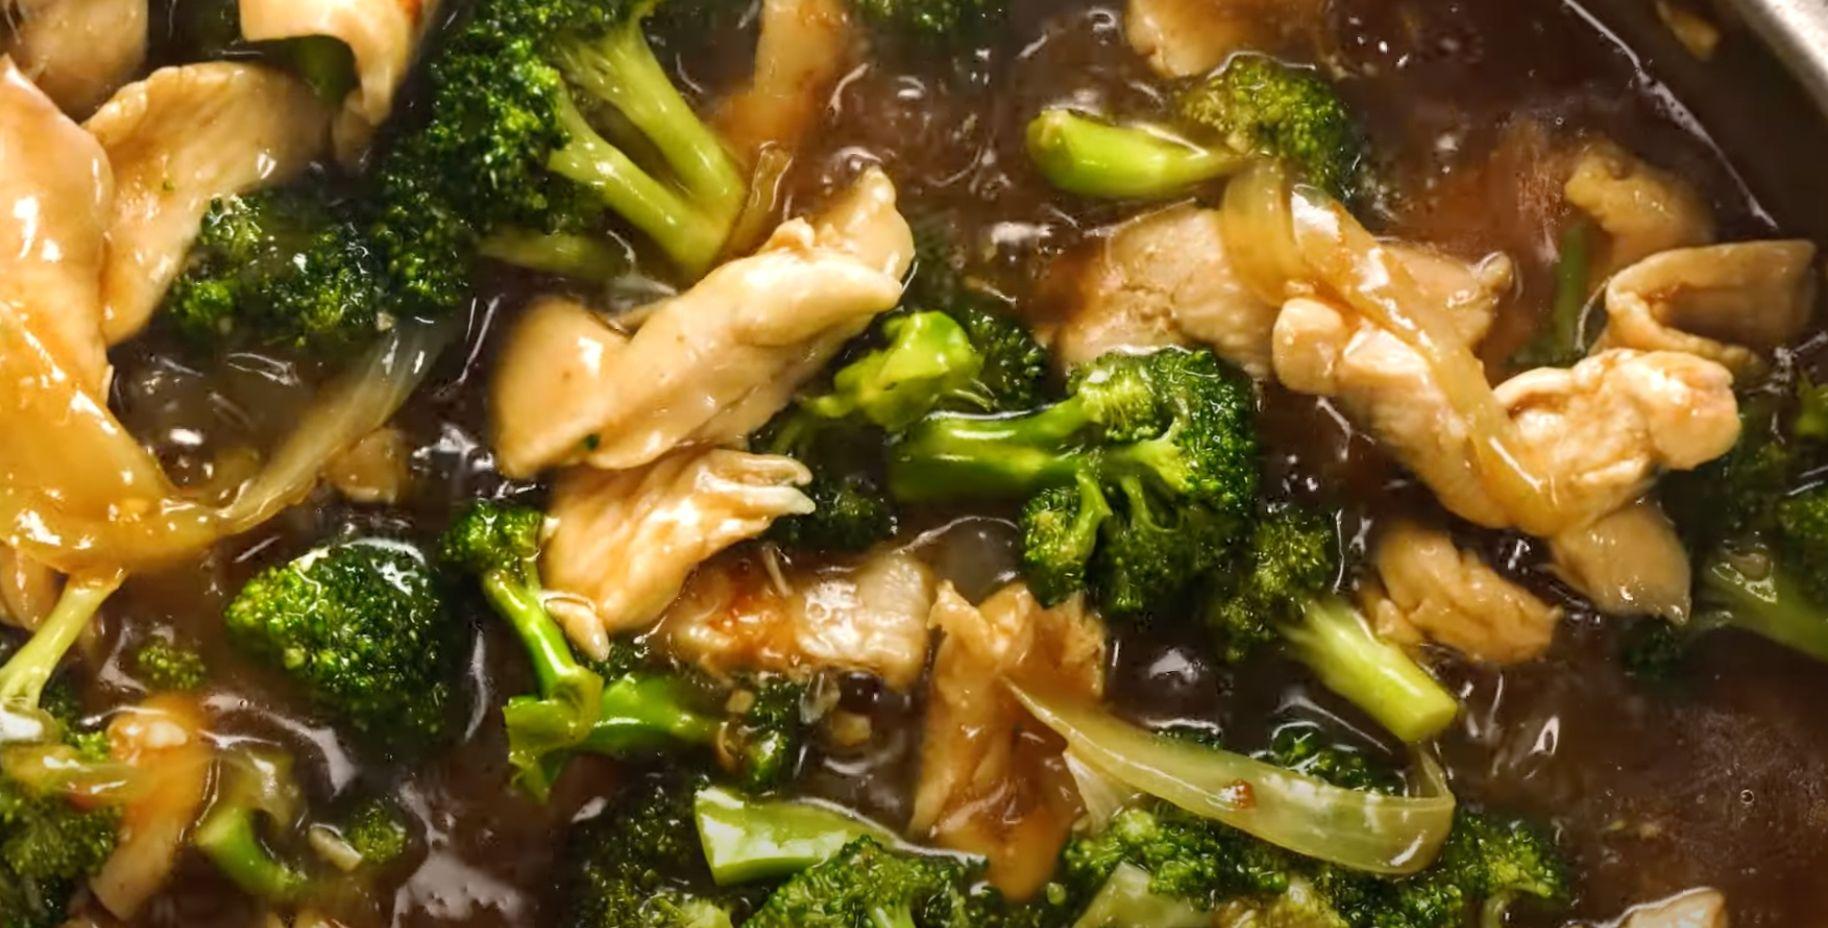 Garlic Chicken and Broccoli Cashew Stir Fry Recipe